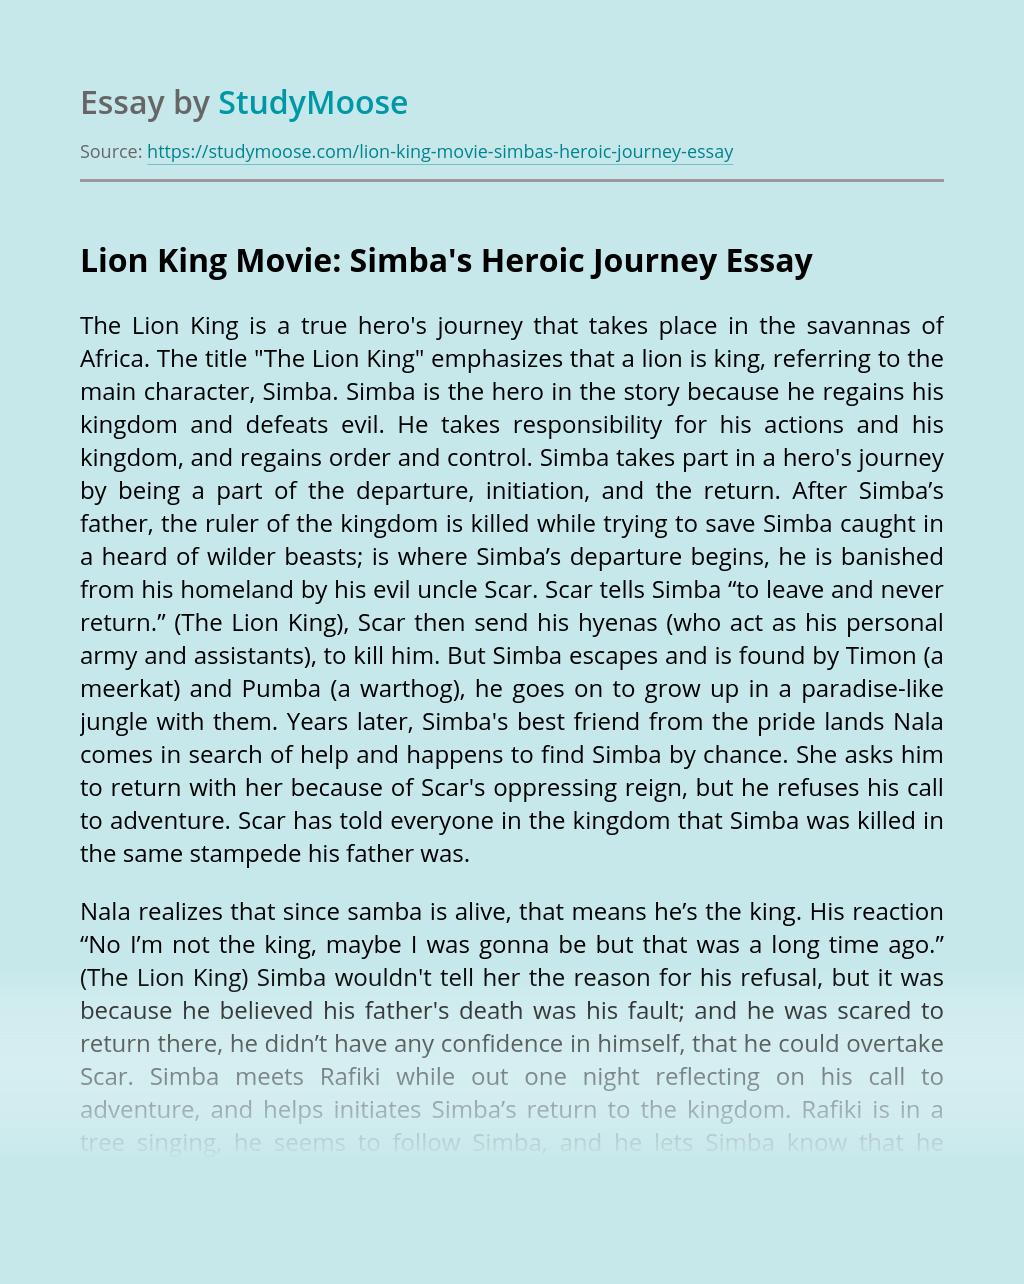 Lion King Movie: Simba's Heroic Journey